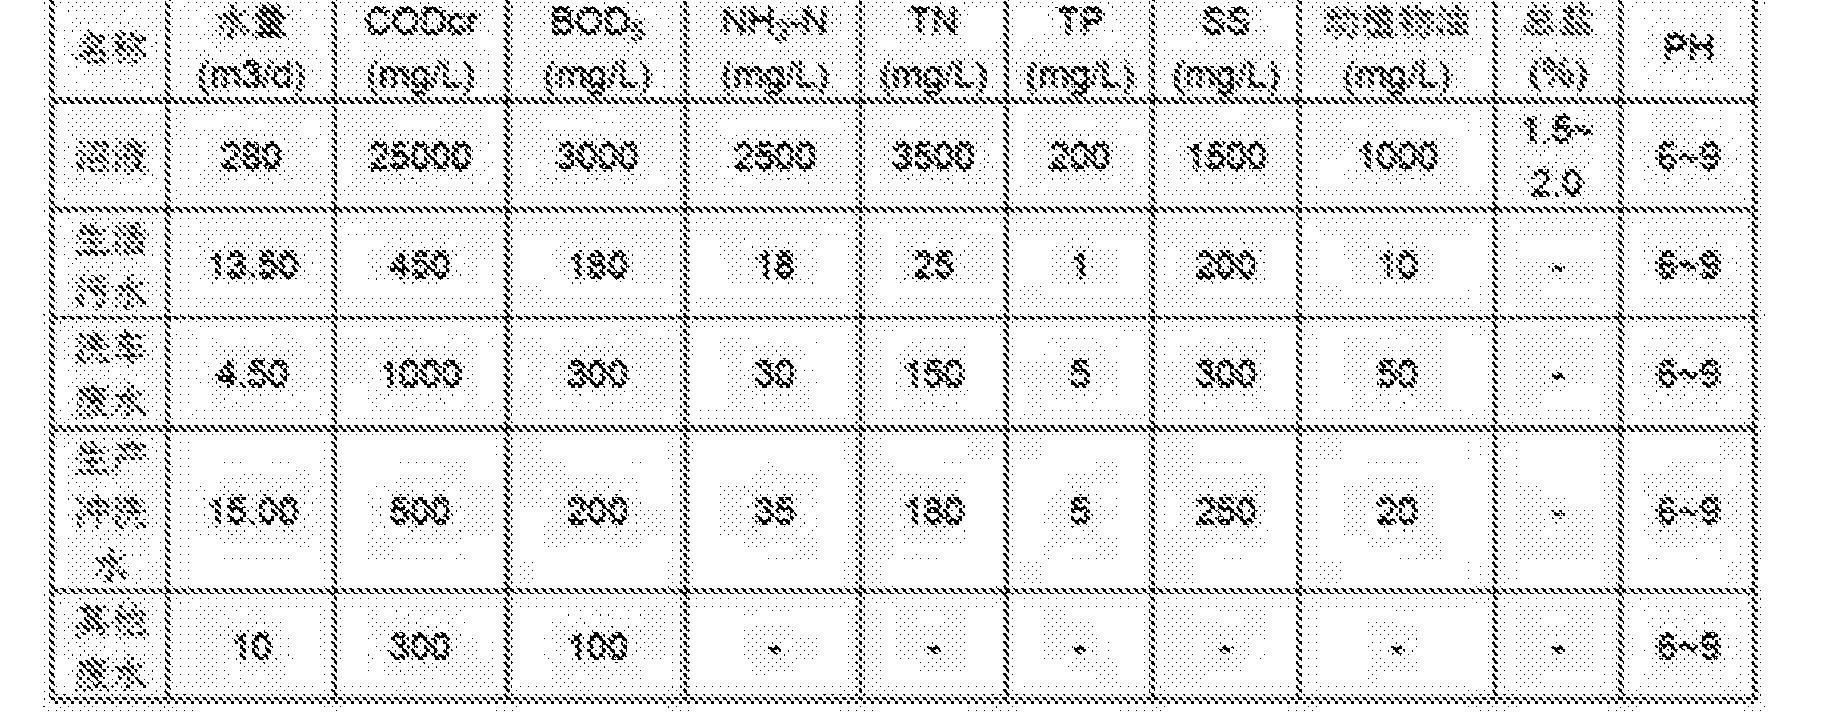 Figure CN205528260UD00051